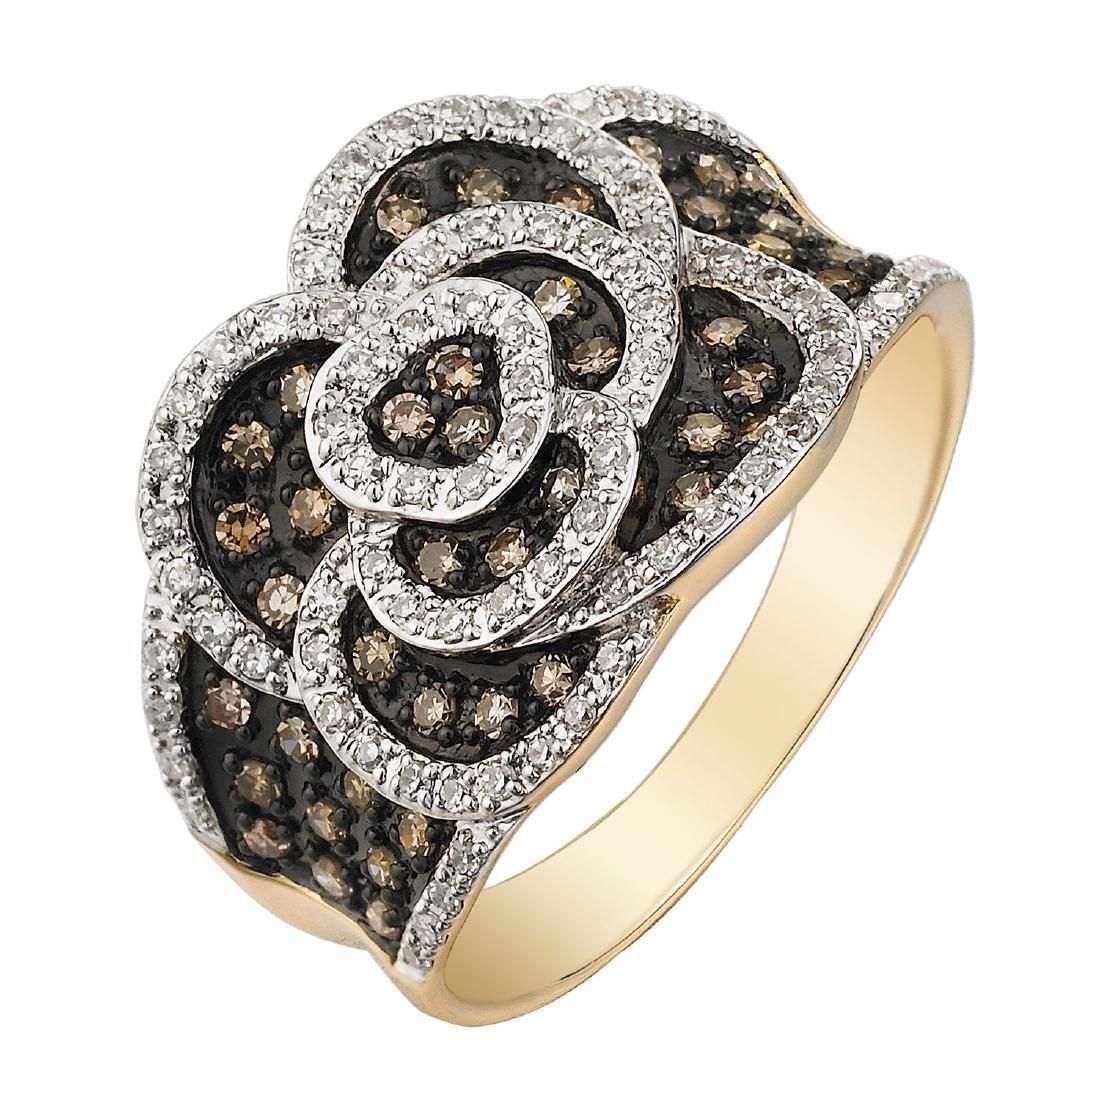 14KT Yellow Gold Women's Diamond Ring - 2